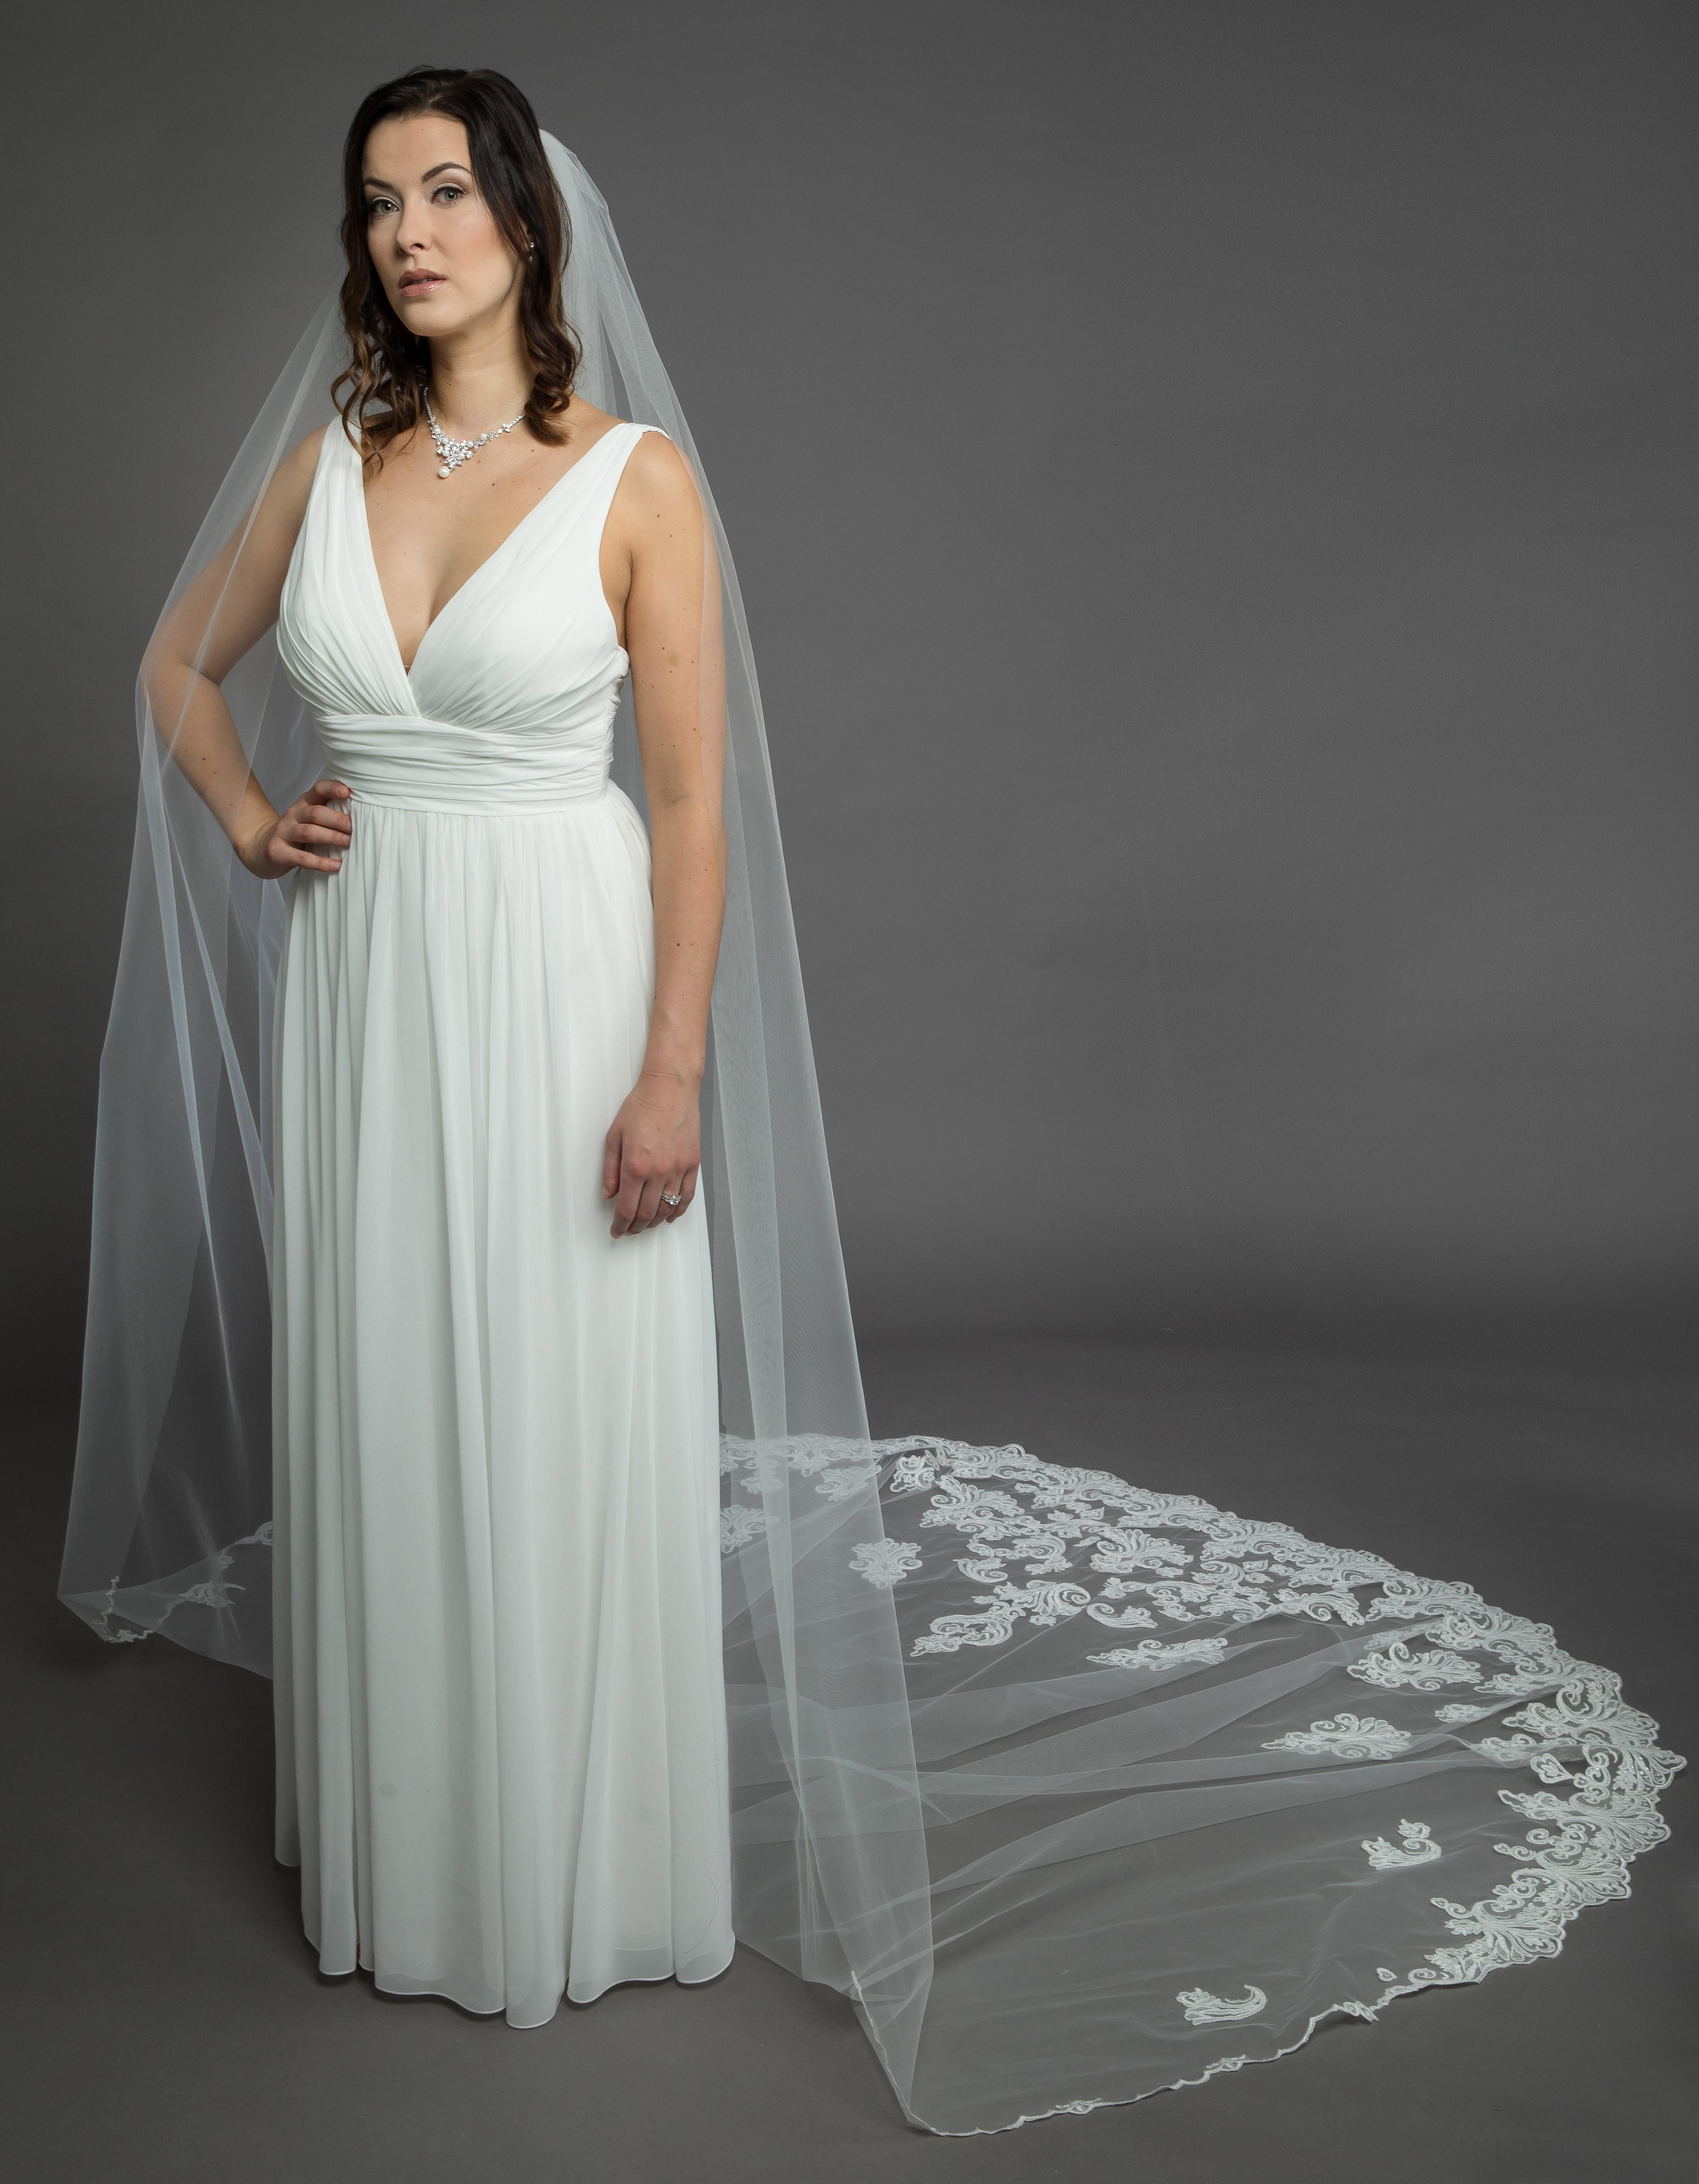 Bridal Classics Marquise Veil Collection MV-2452